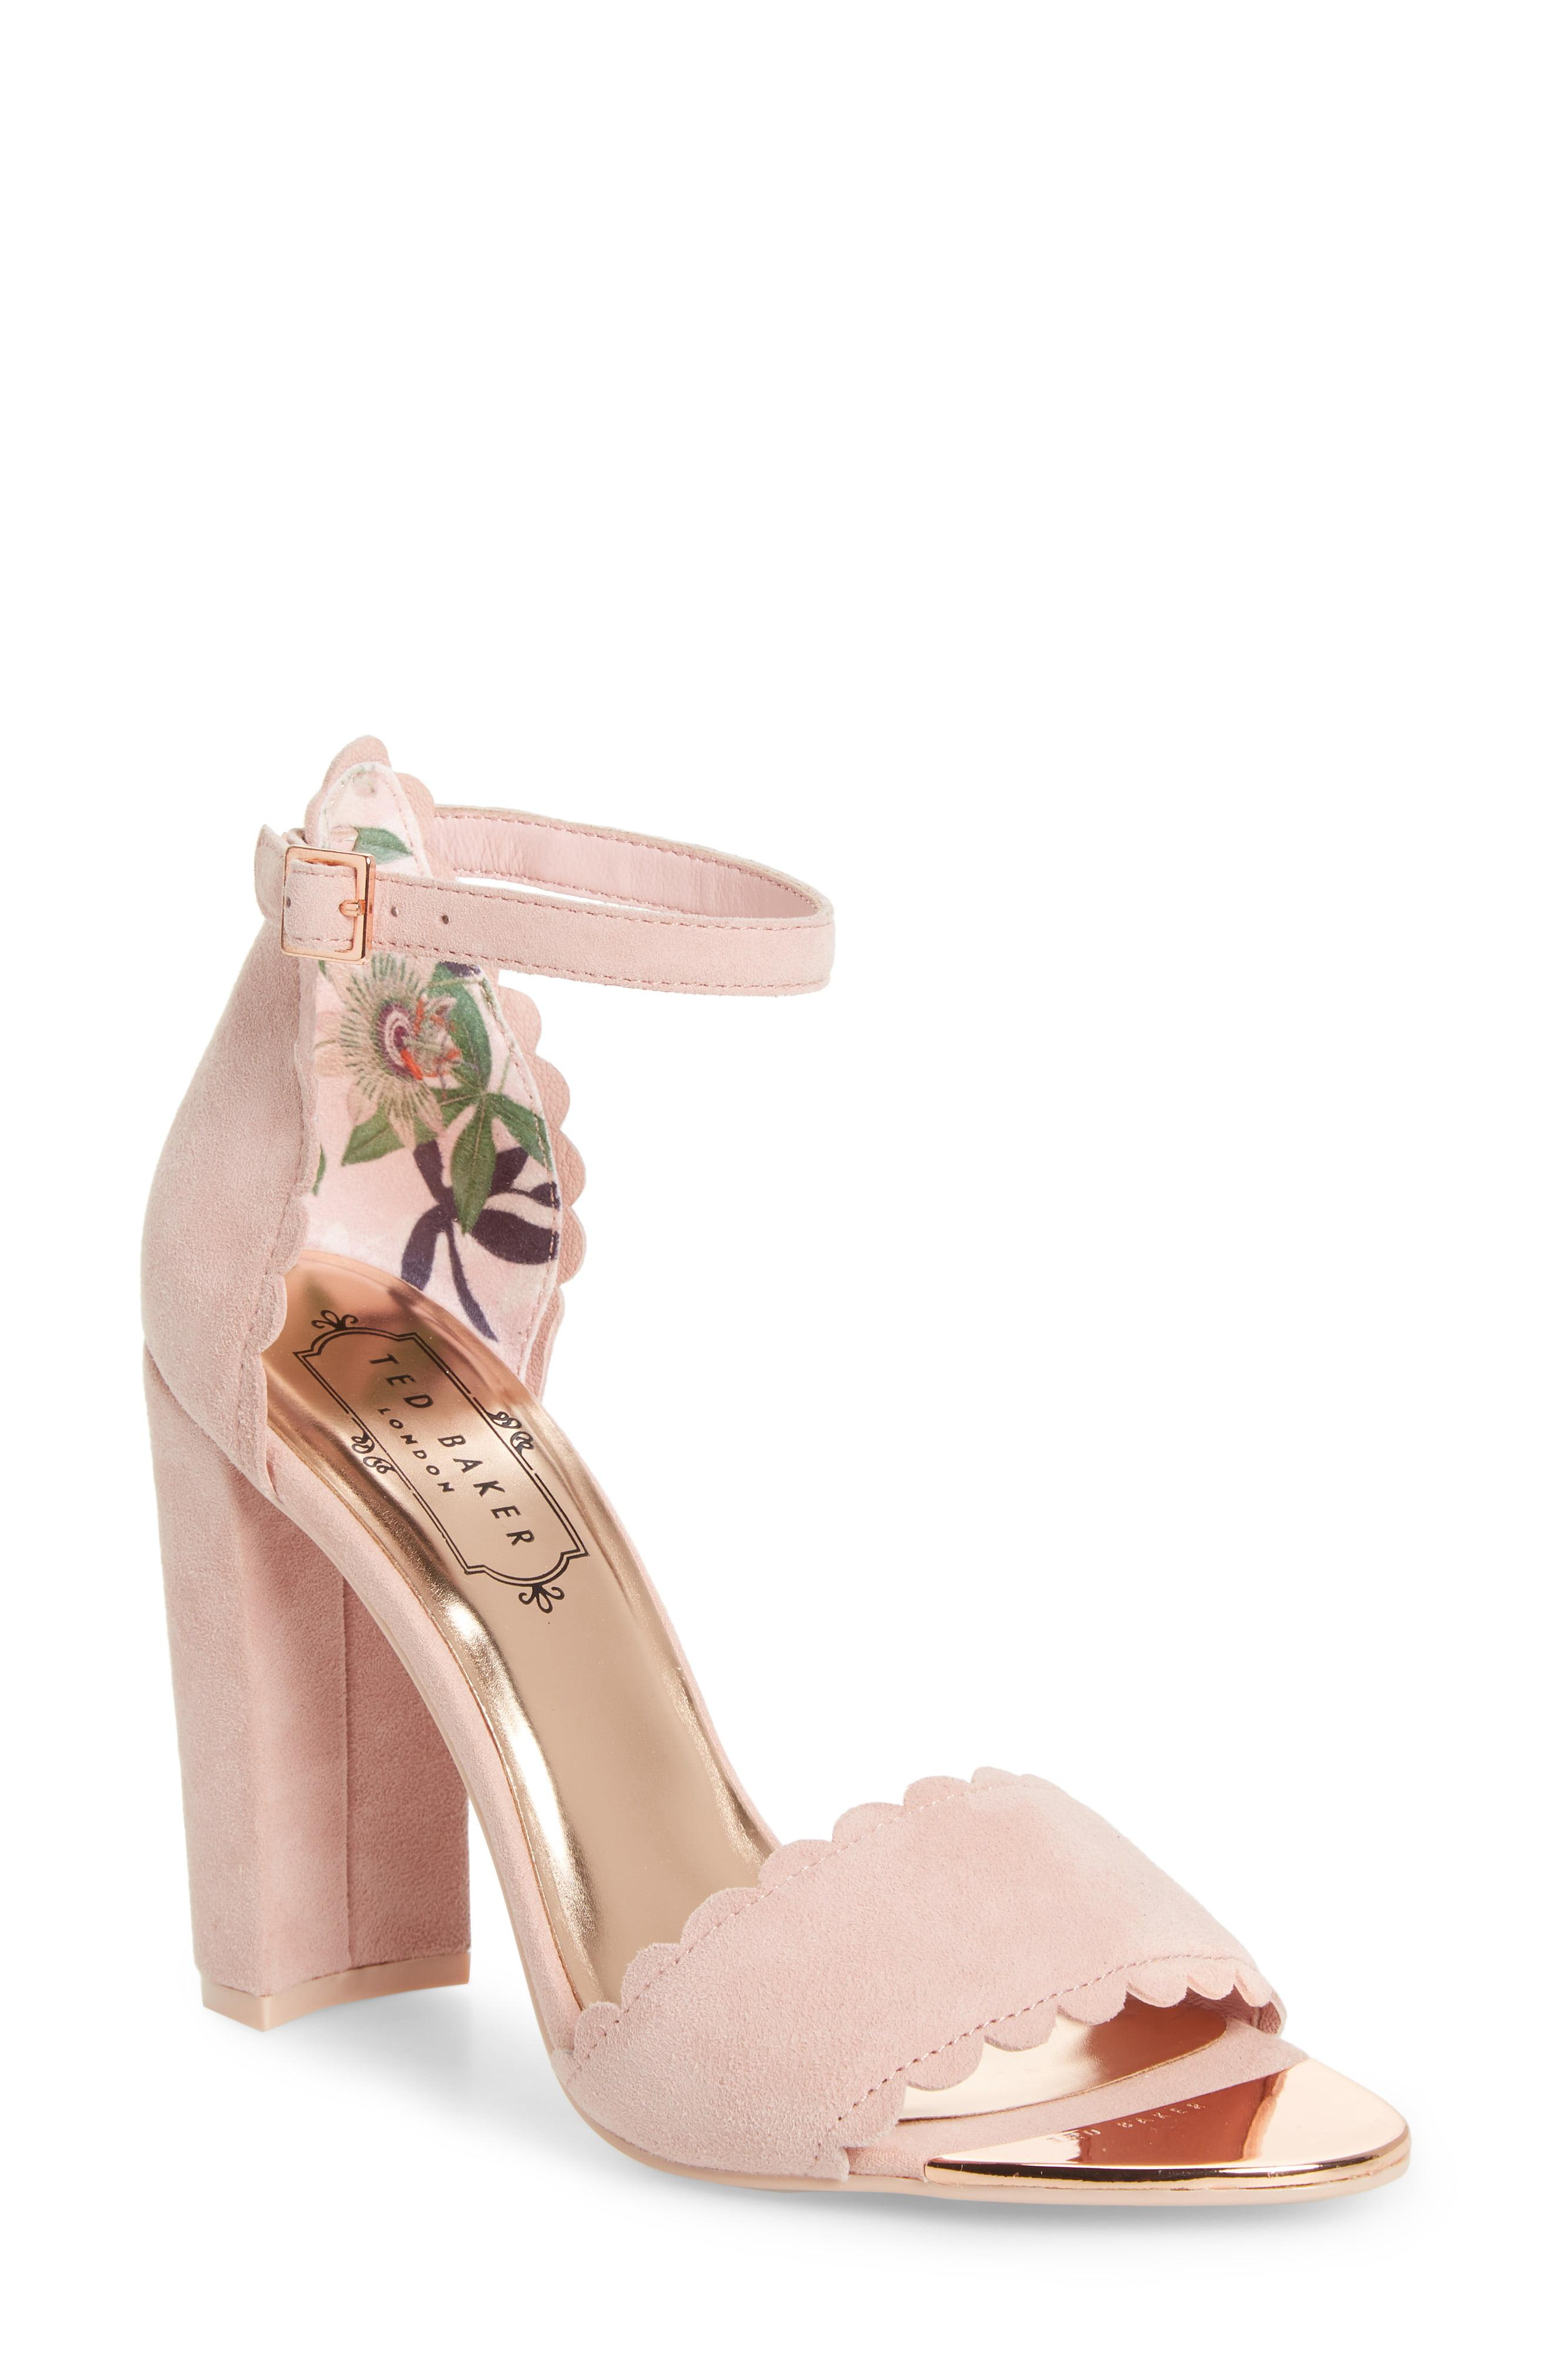 25a758339 Lyst - Ted Baker Raidha Sandal in Pink